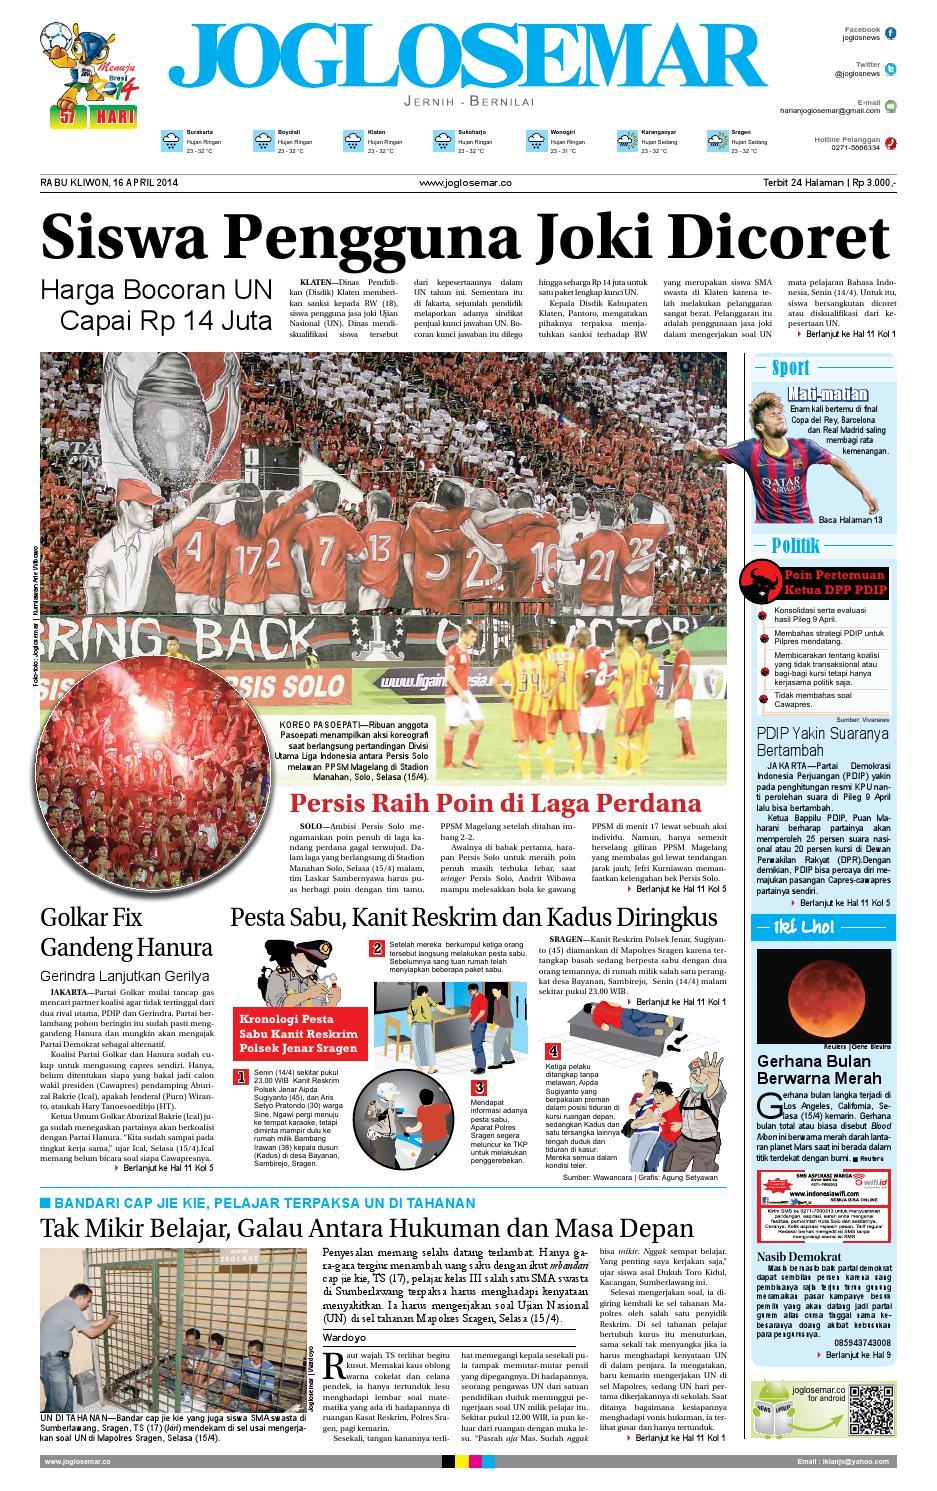 Epaper edisi 16 april 2014 by PT Joglosemar Prima Media - issuu 0a9f3fabf5